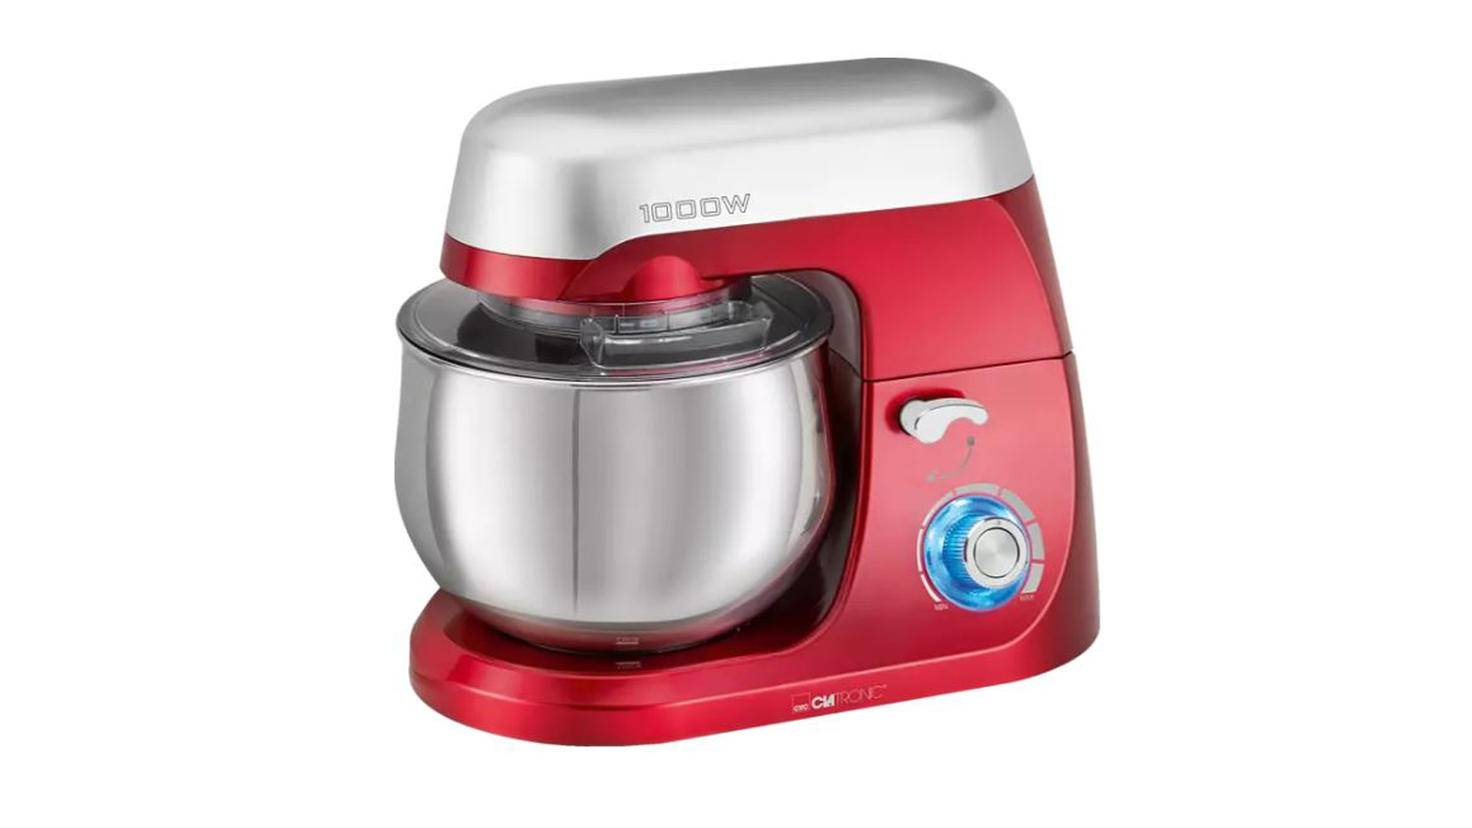 Robot culinaire Clatronic KM 3709